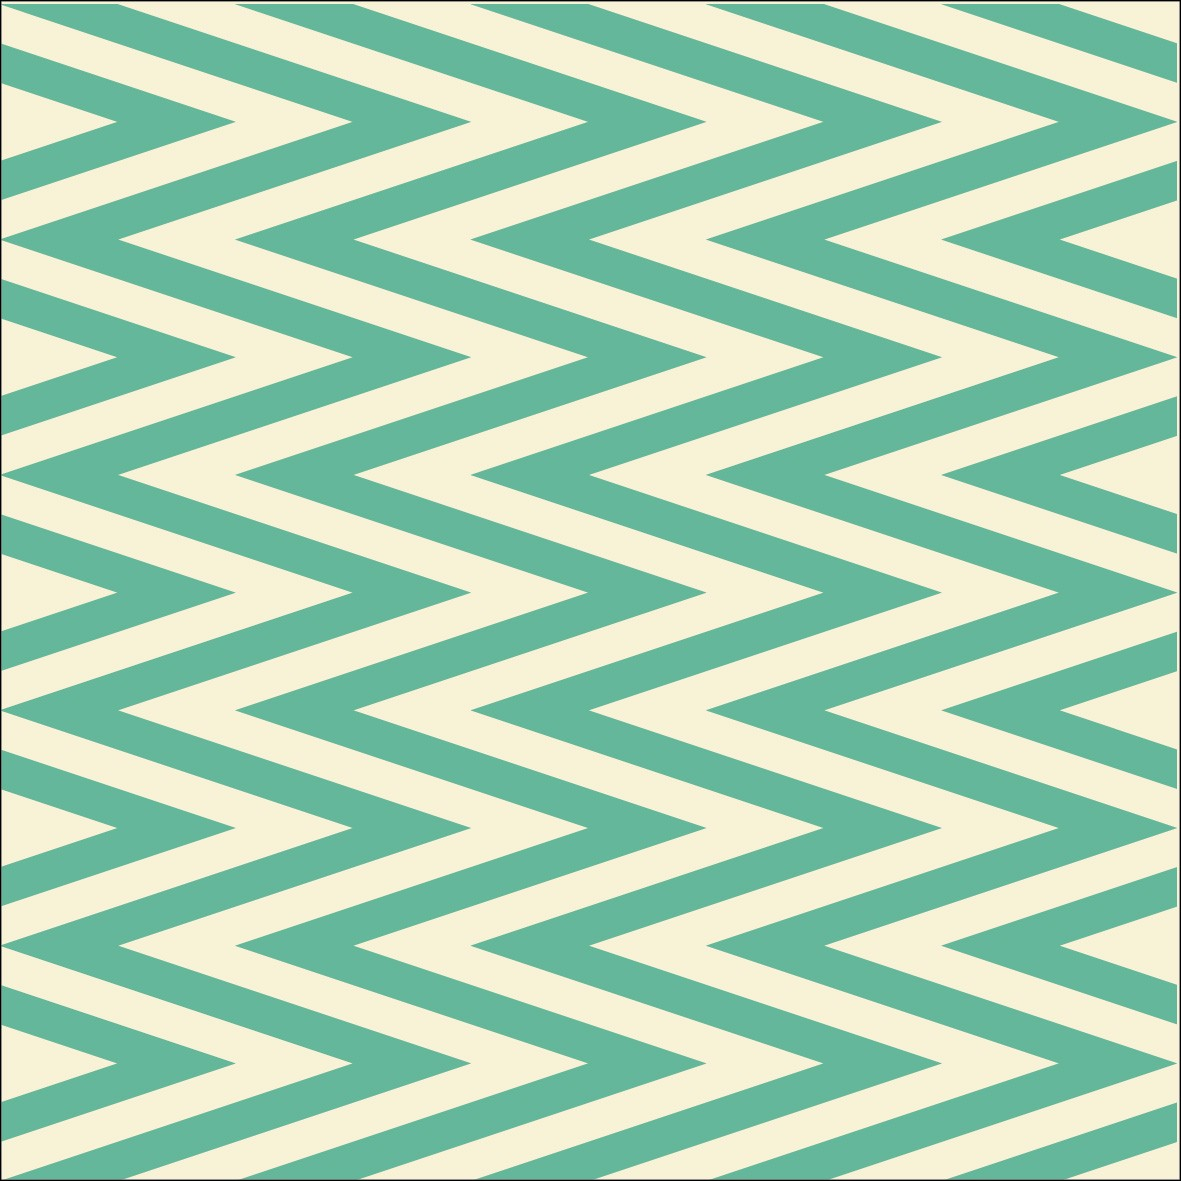 KIT Adesivos de Azulejos Zig Zag Retrô